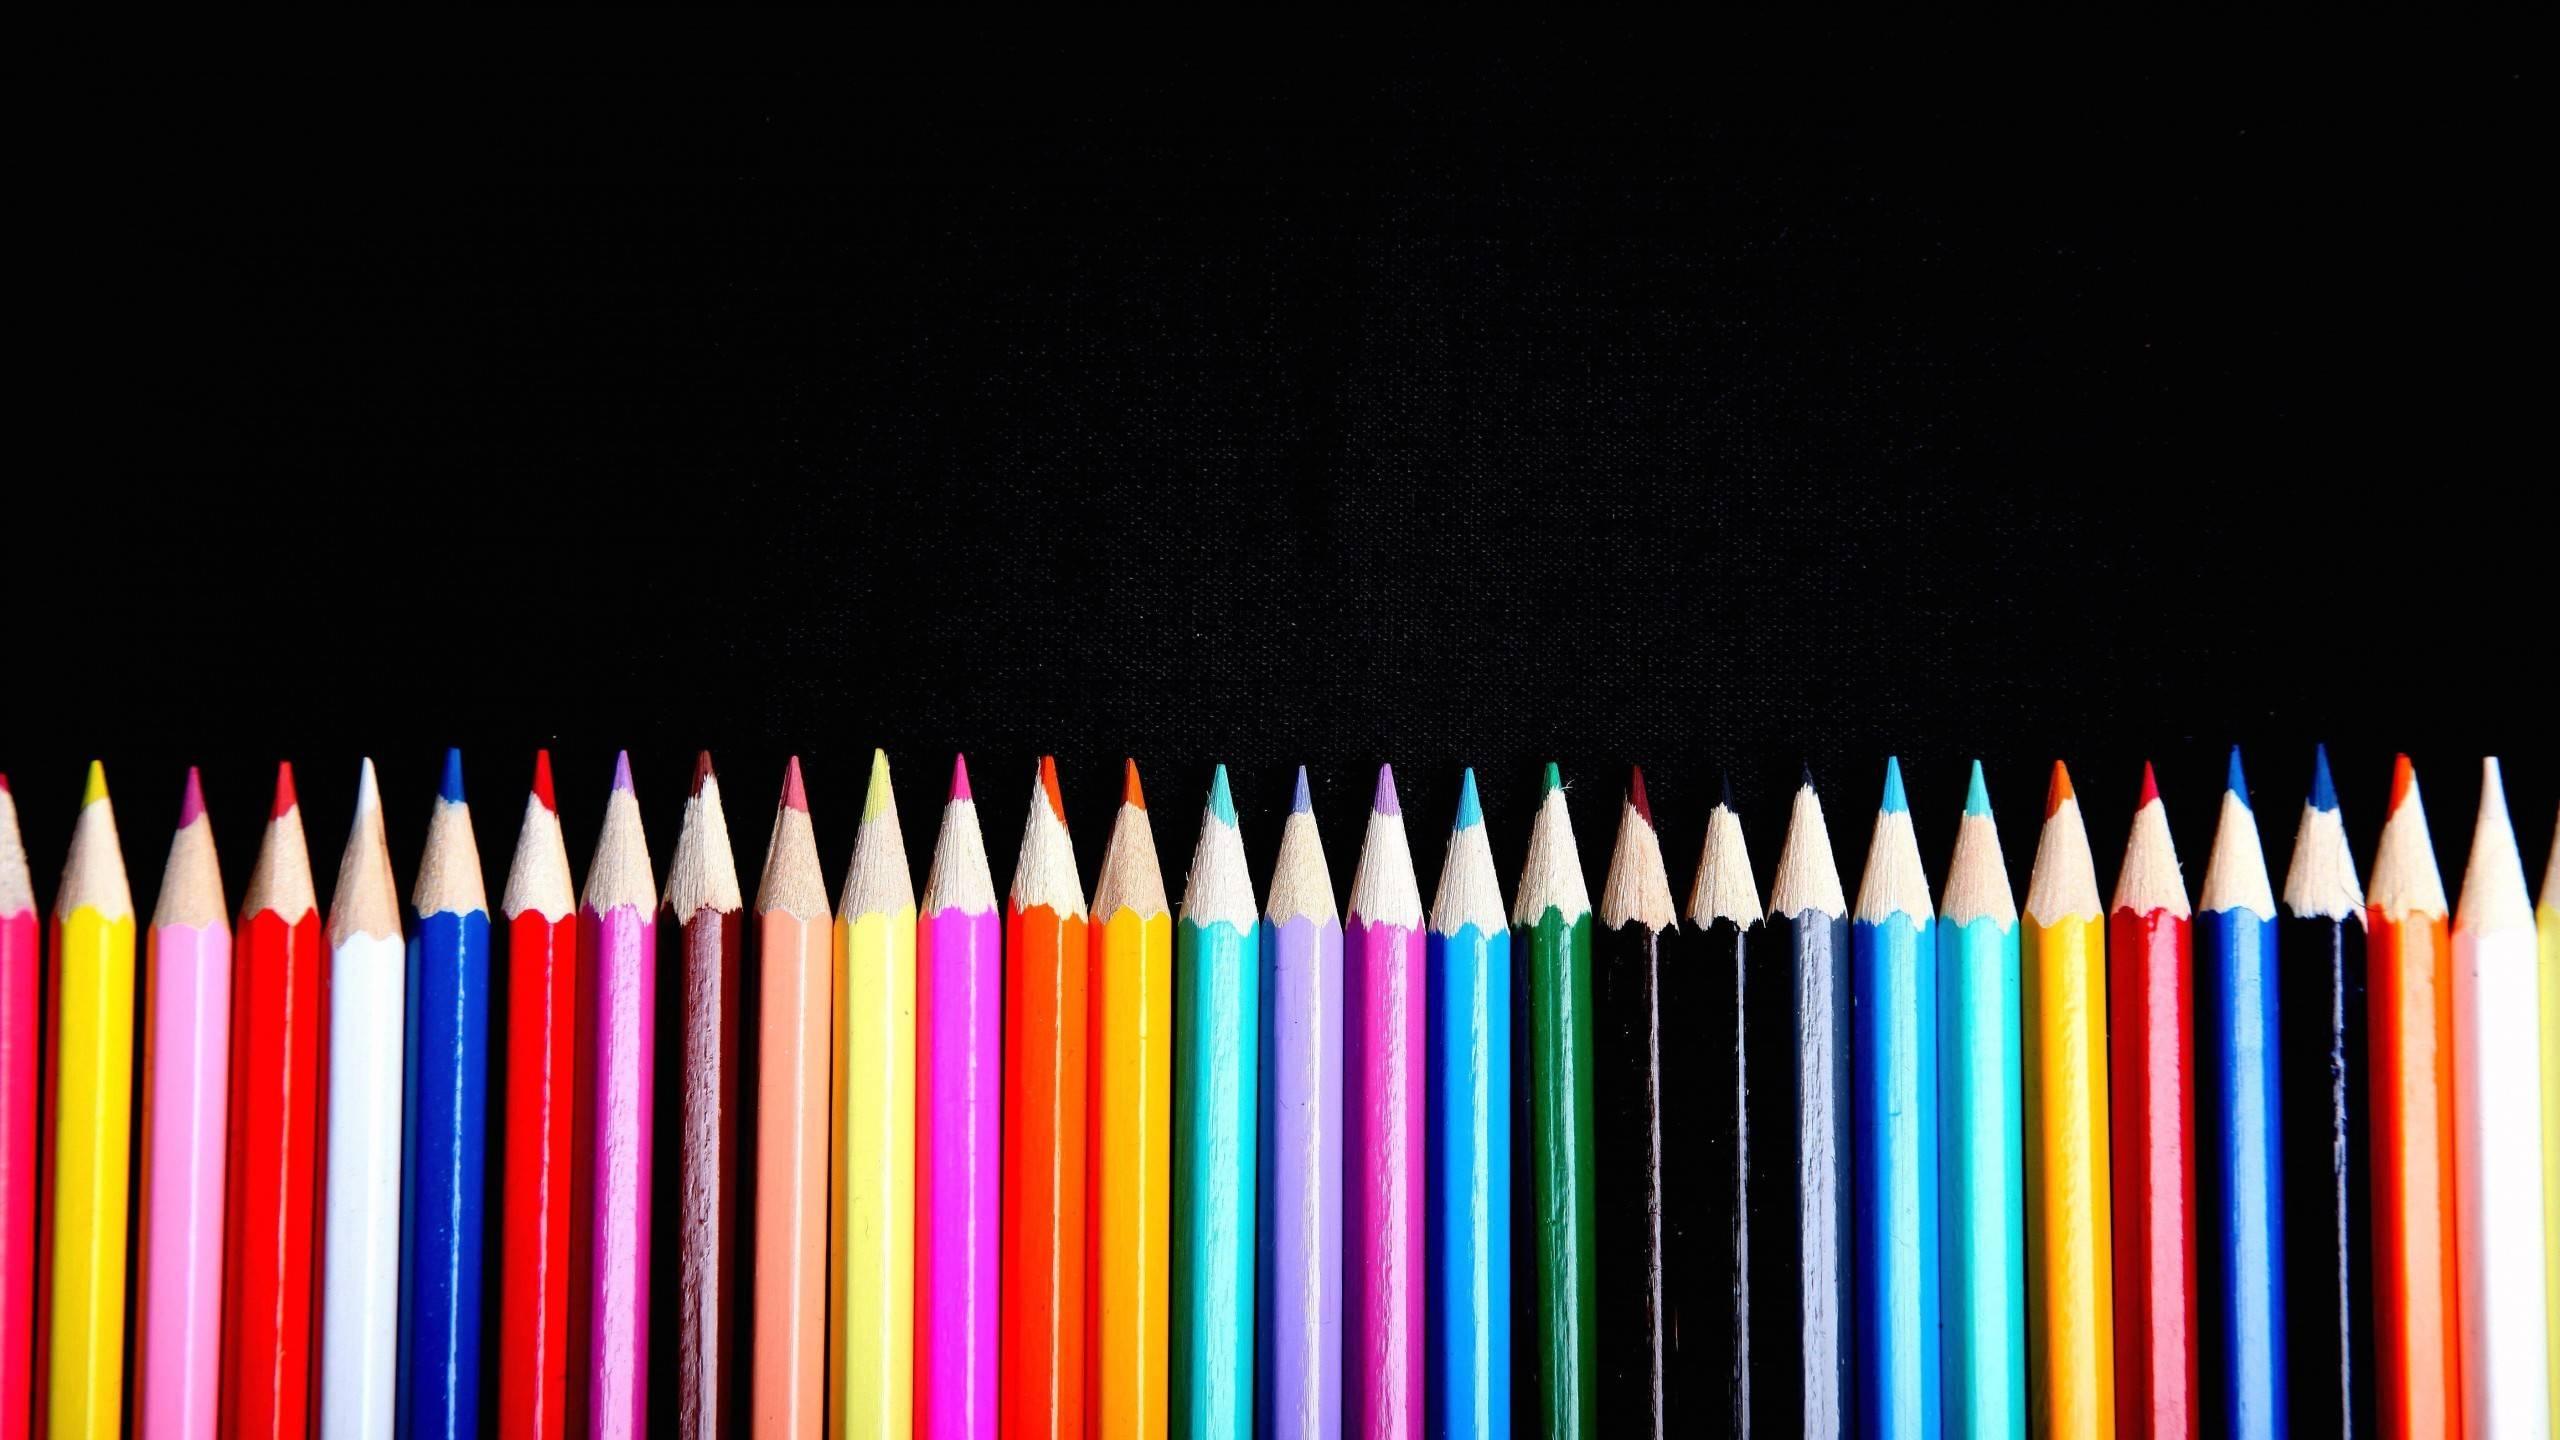 Pencil Border Colorful Craft Uhd